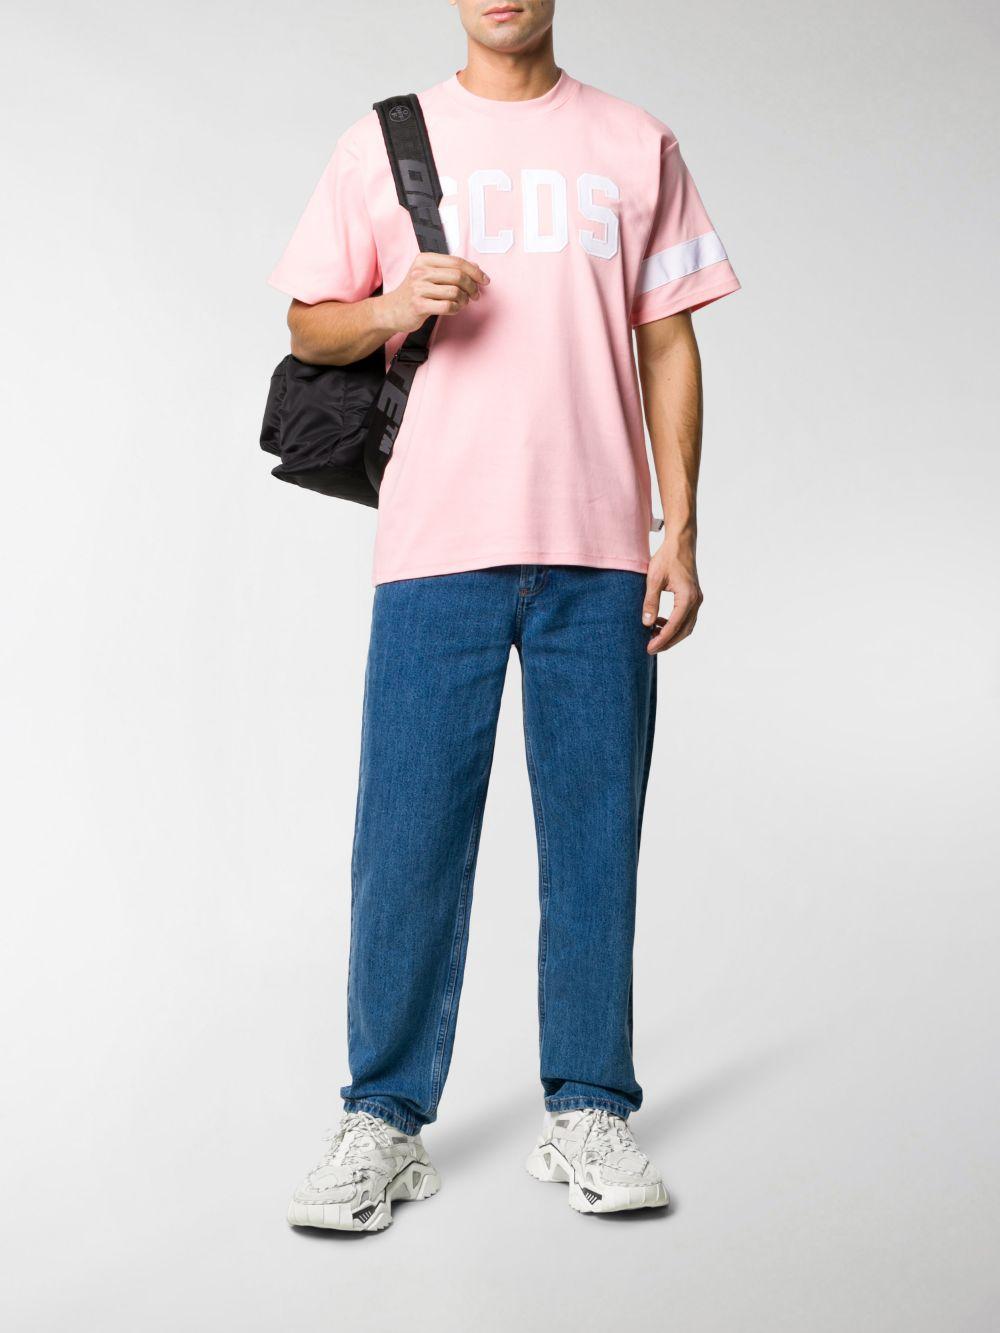 T-Shirt Logo Rosa Uomo Cotone GCDS | T-shirt | CC94M02100406